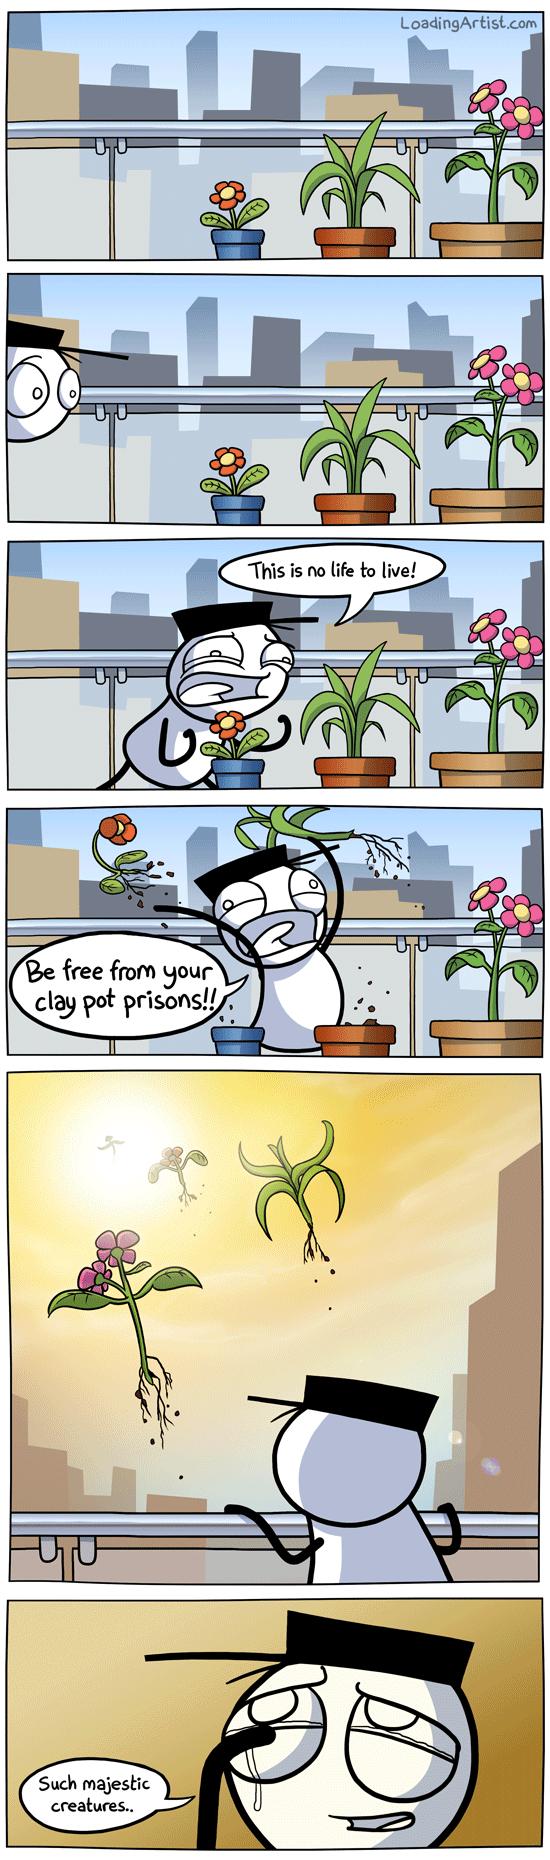 "Poor plants. . clay poi pr' us. ona!."". My life in a nutshell."